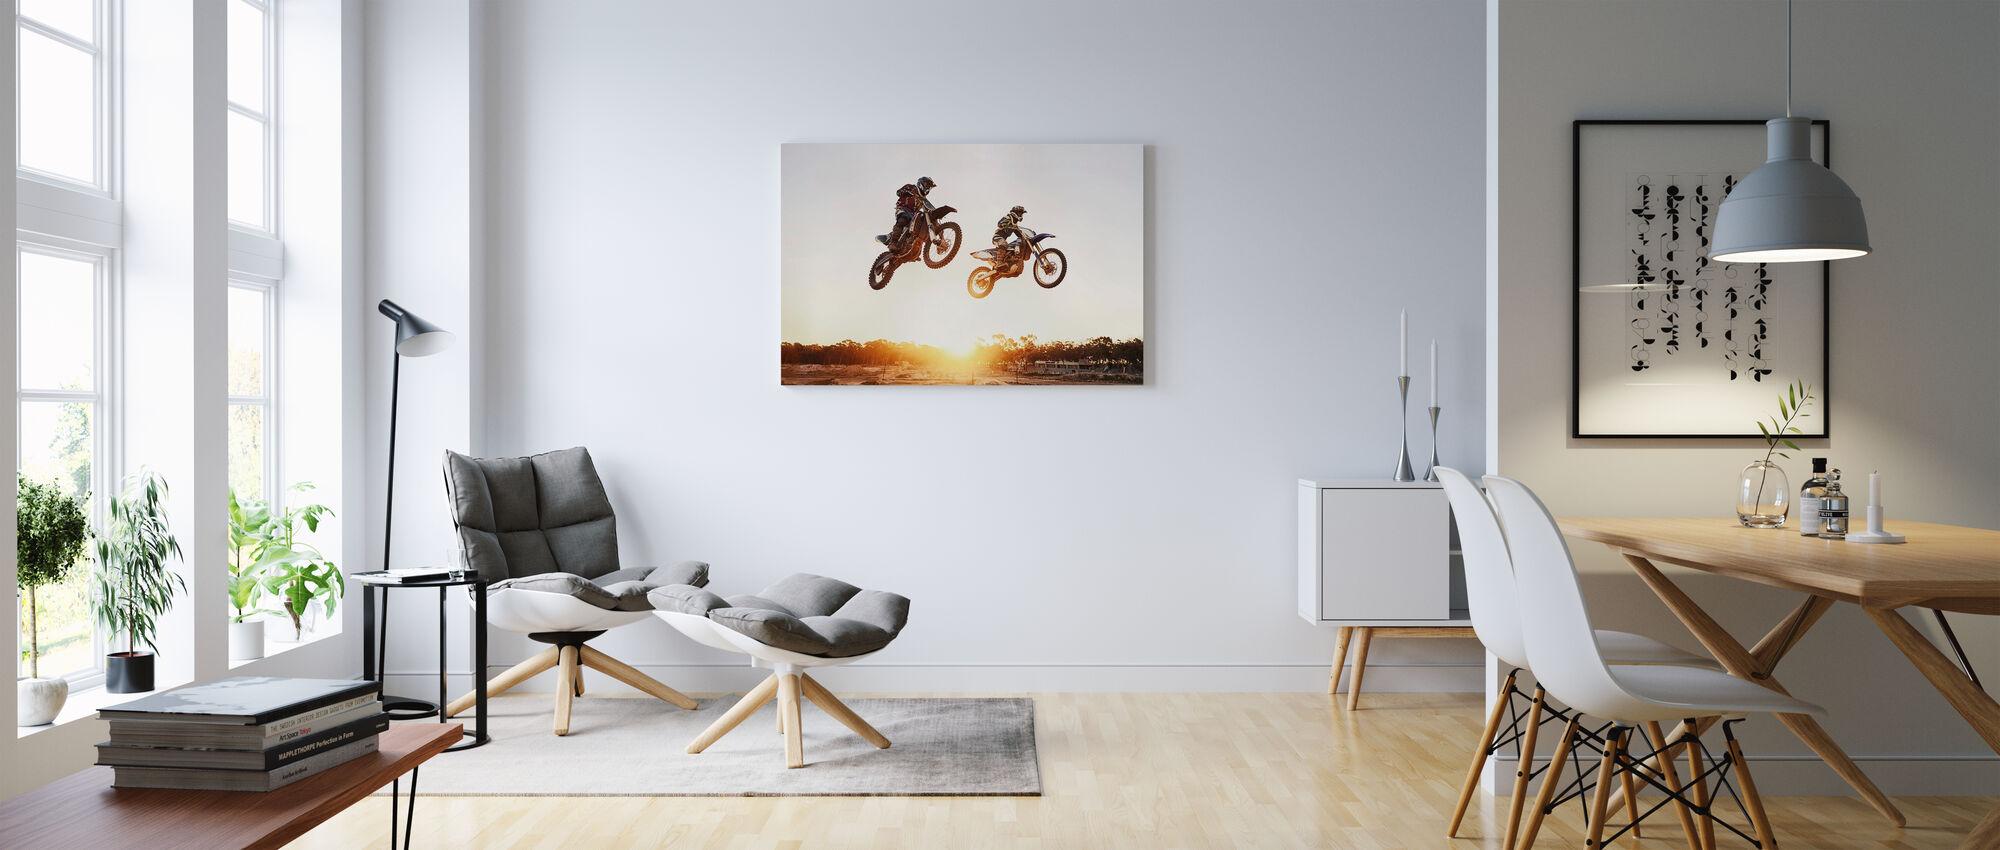 Off Road Racing - Canvas print - Living Room